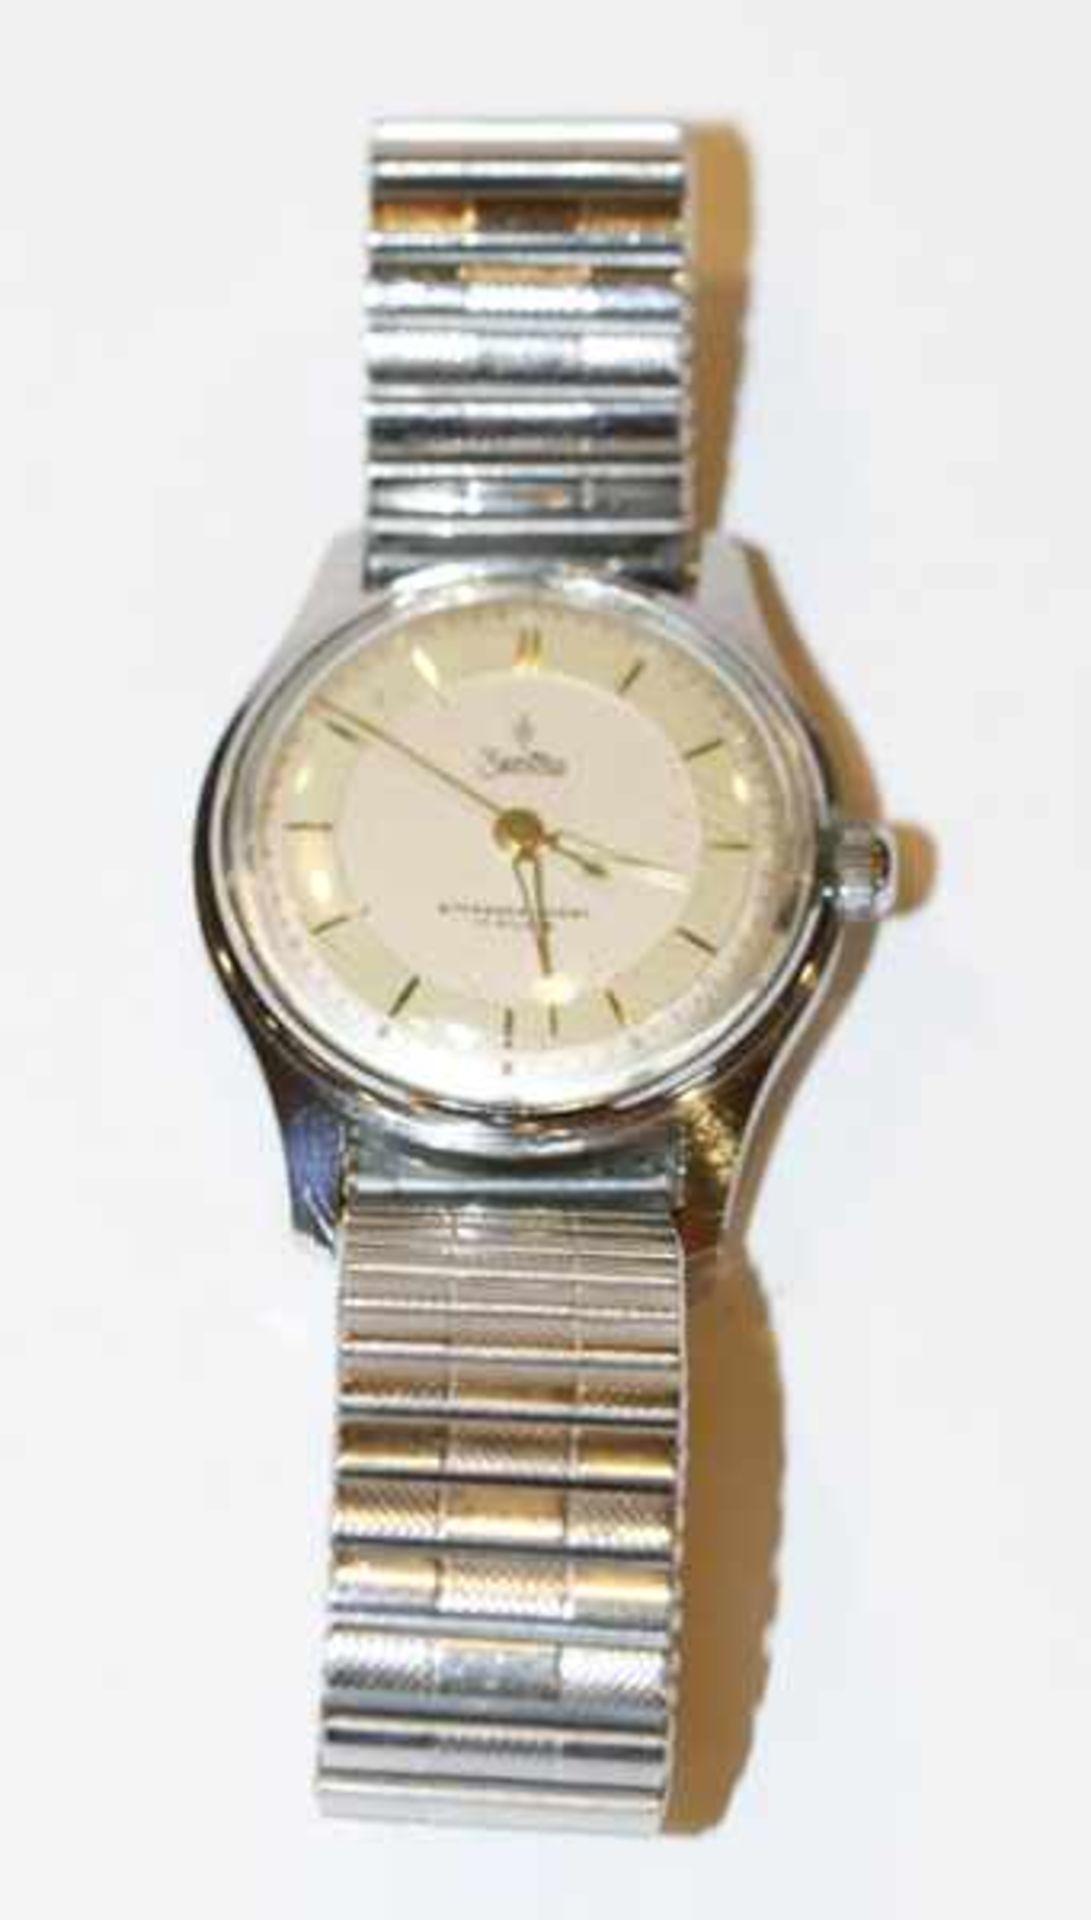 Los 9 - Zentra, Schweiz, Armbanduhr, intakt, an Fixo-Flex Armband, Tragespuren